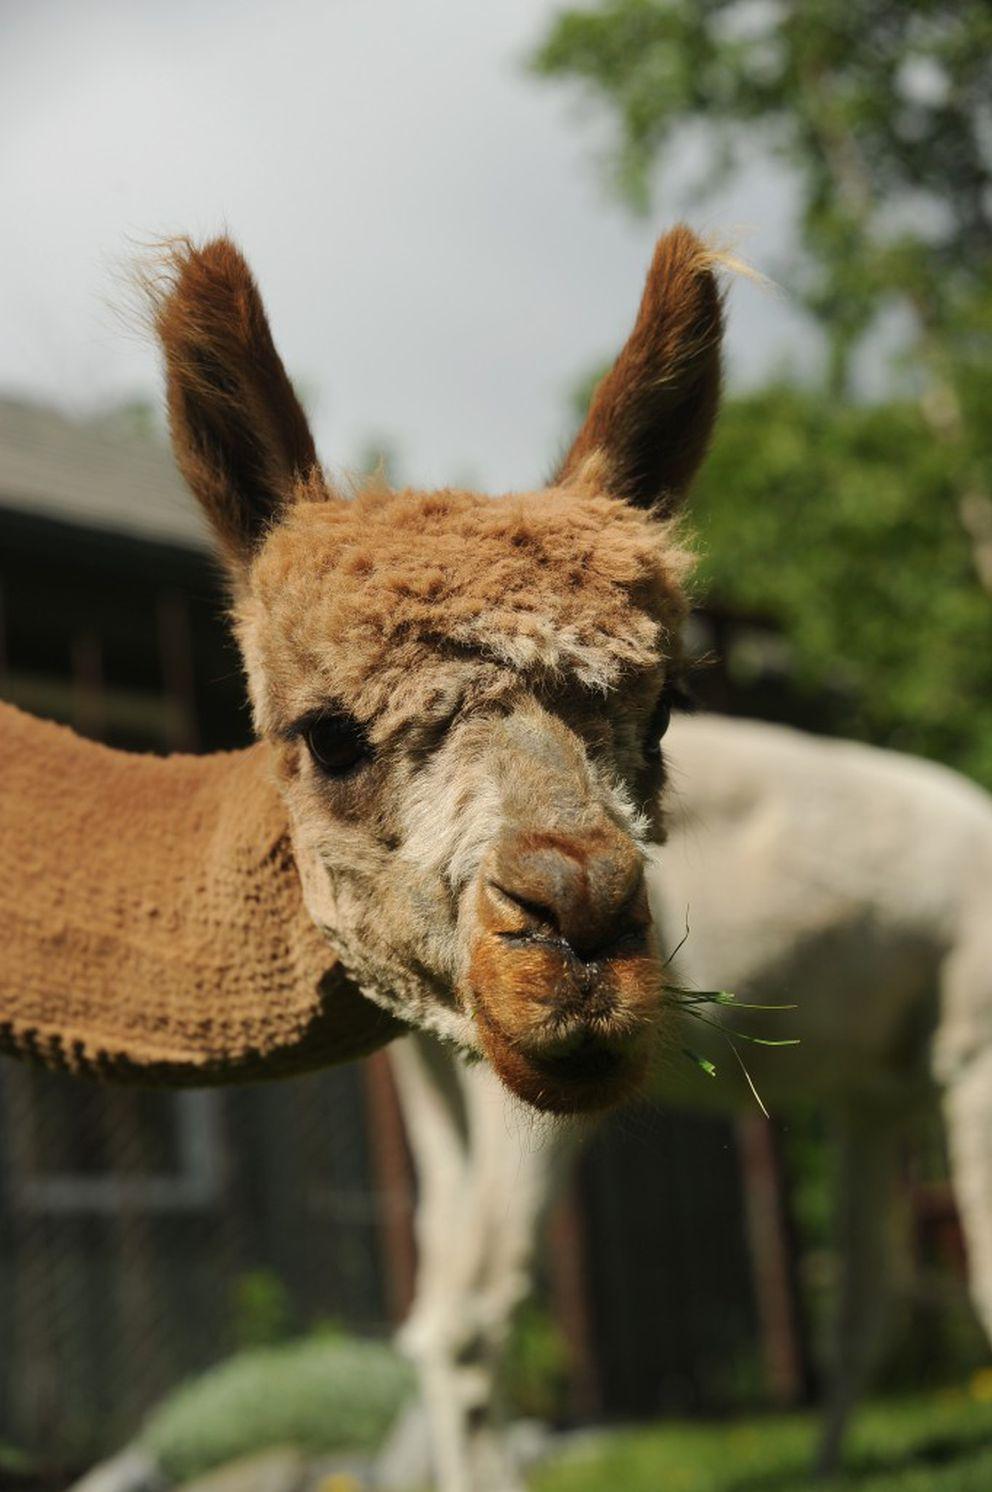 Mijo, one of Michelle Coburn's alpacas, grazes in the backyard of her home in south Anchorage. (Bob Hallinen / Alaska Dispatch News)